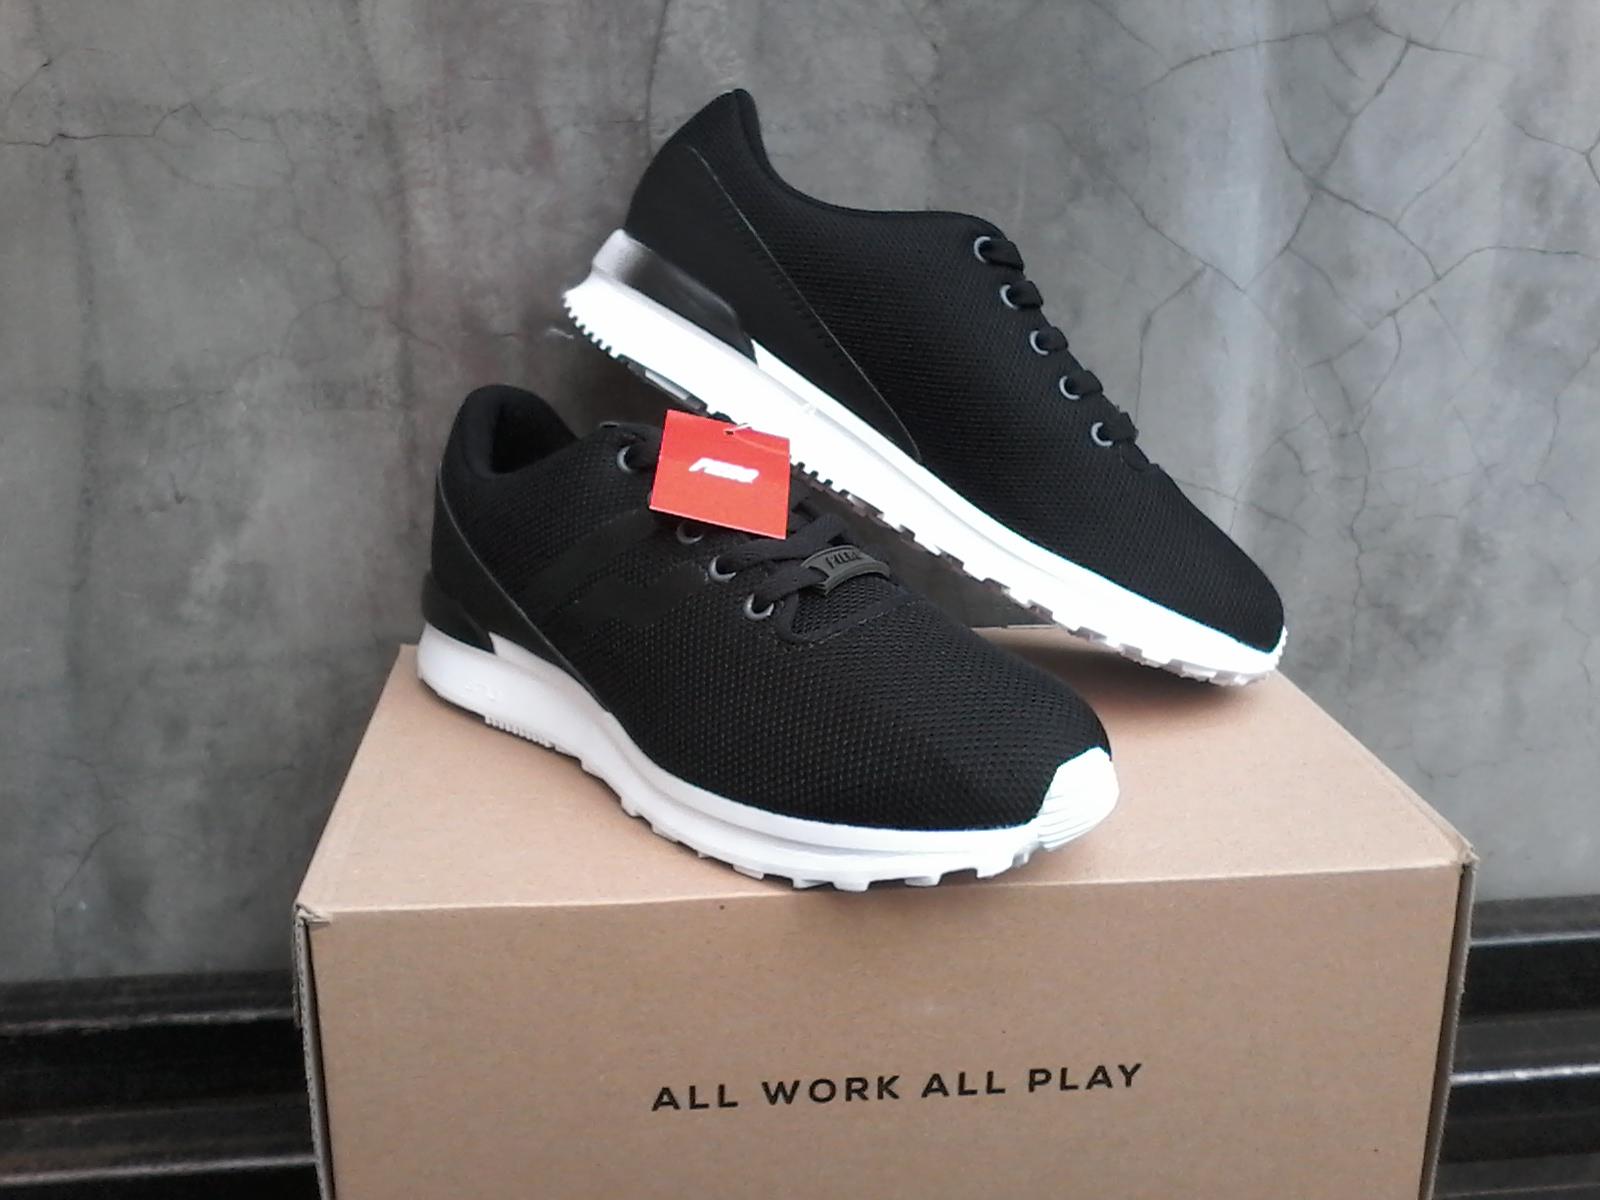 Sepatu casual Piero VX9 Monochrome Black White ~ Toko Sepatu ... 6352fd6de9